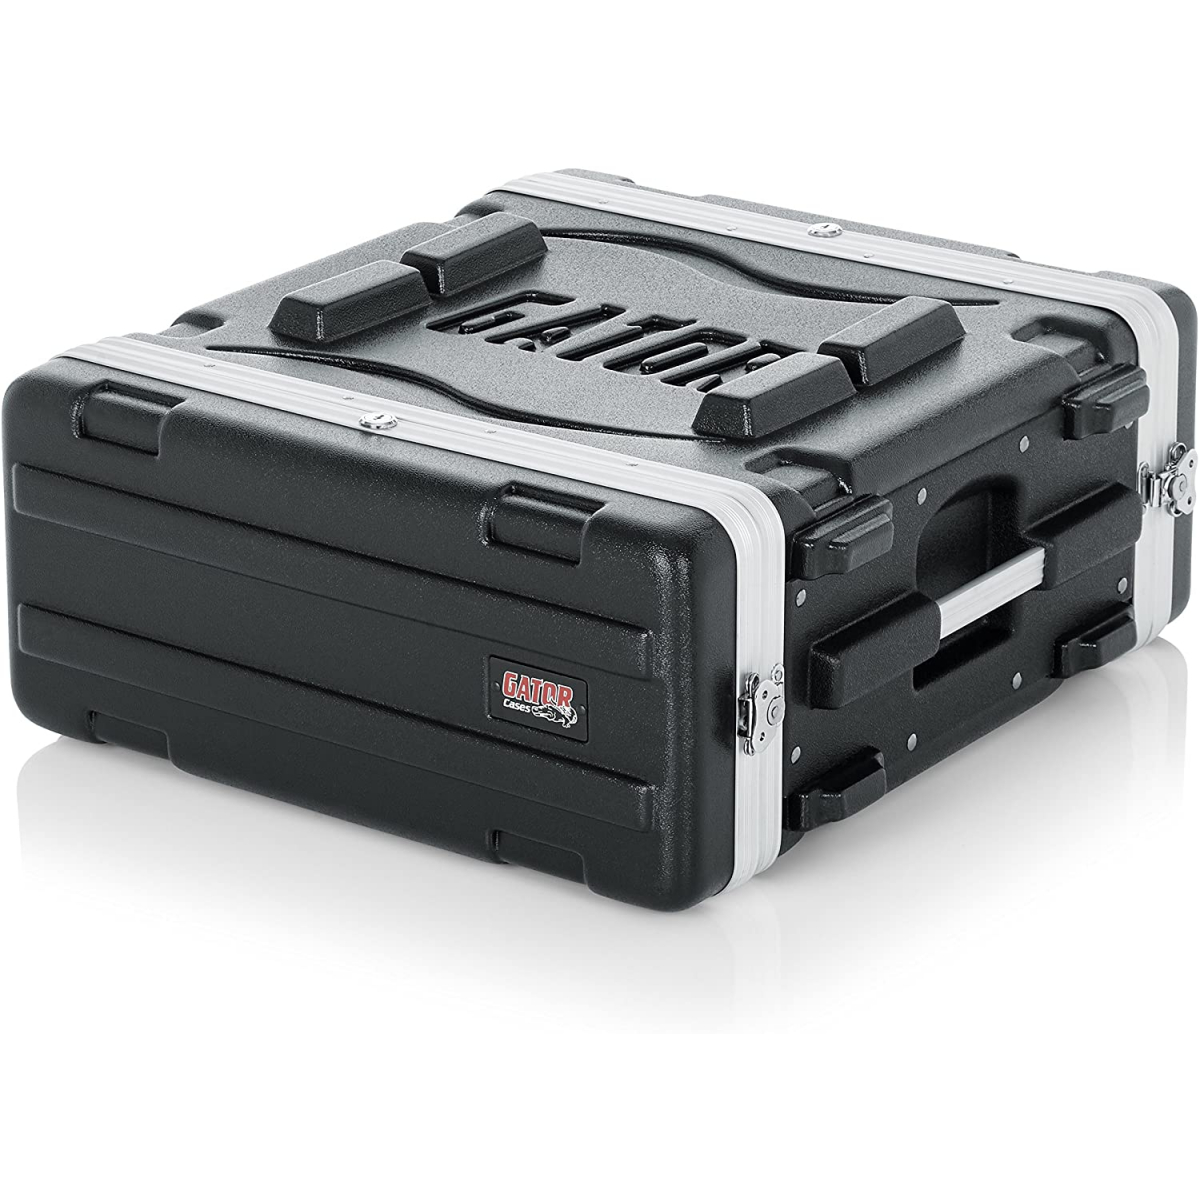 Flight cases rackables ABS - Gator - GR-4L